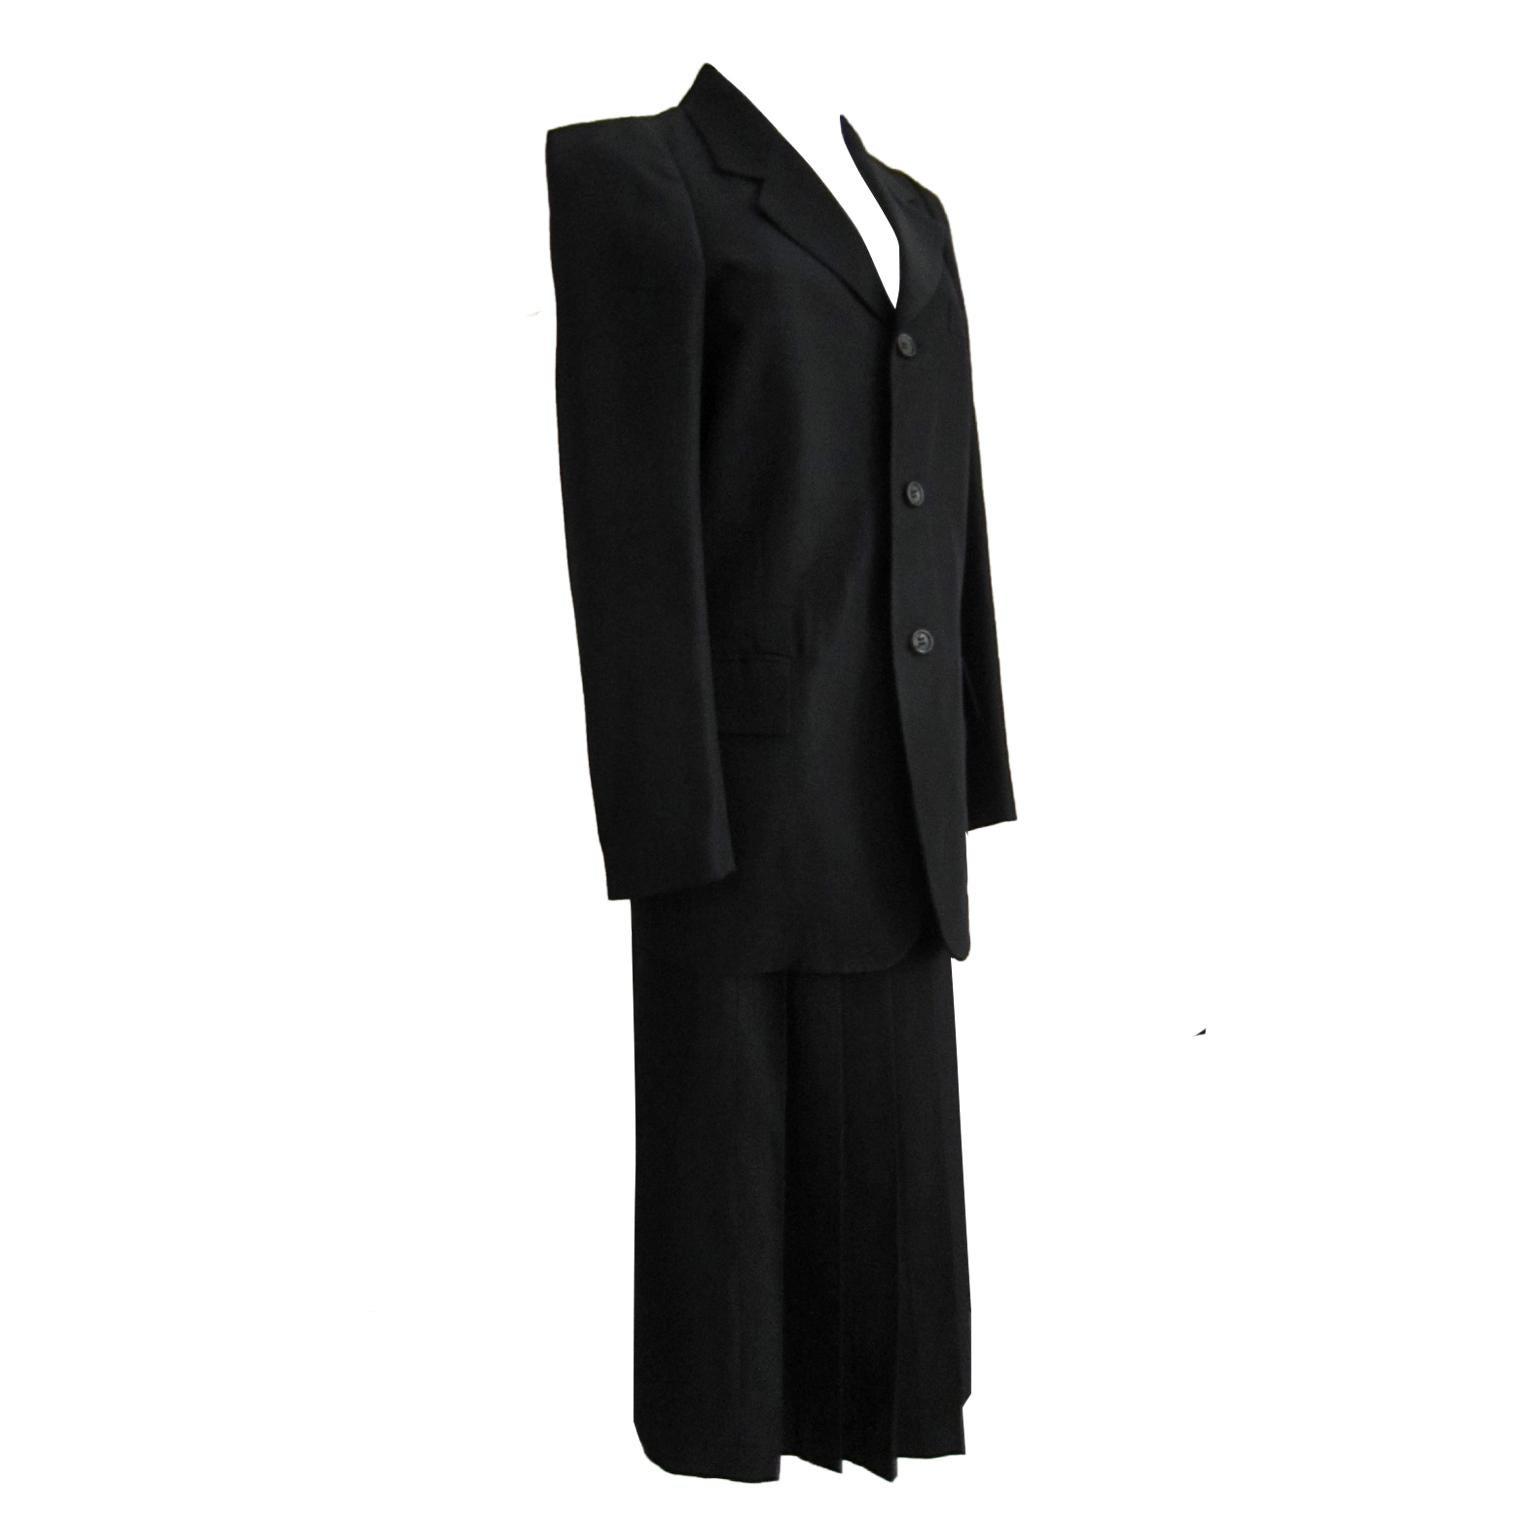 Garçons Coat Comme Raw Des Noir Edge Oversized TzvHqYv